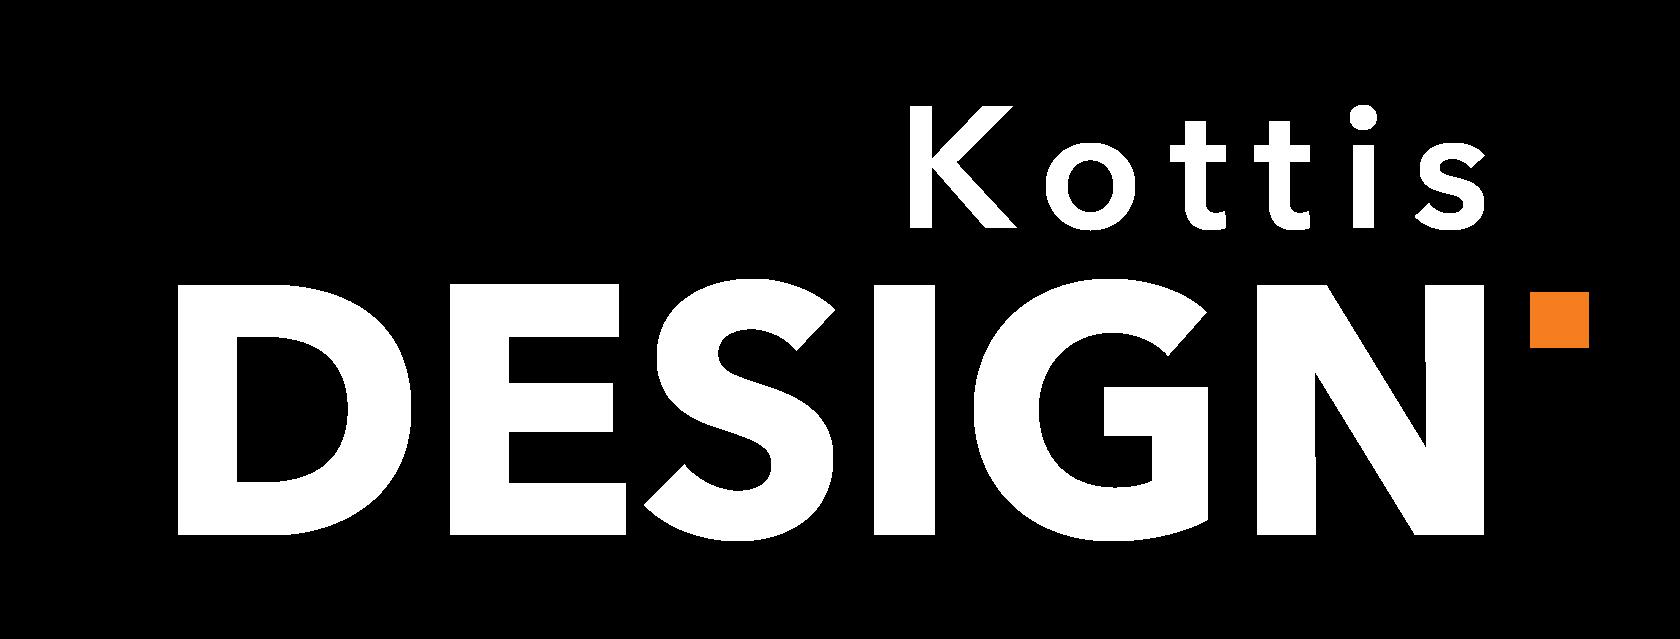 Kottis Design